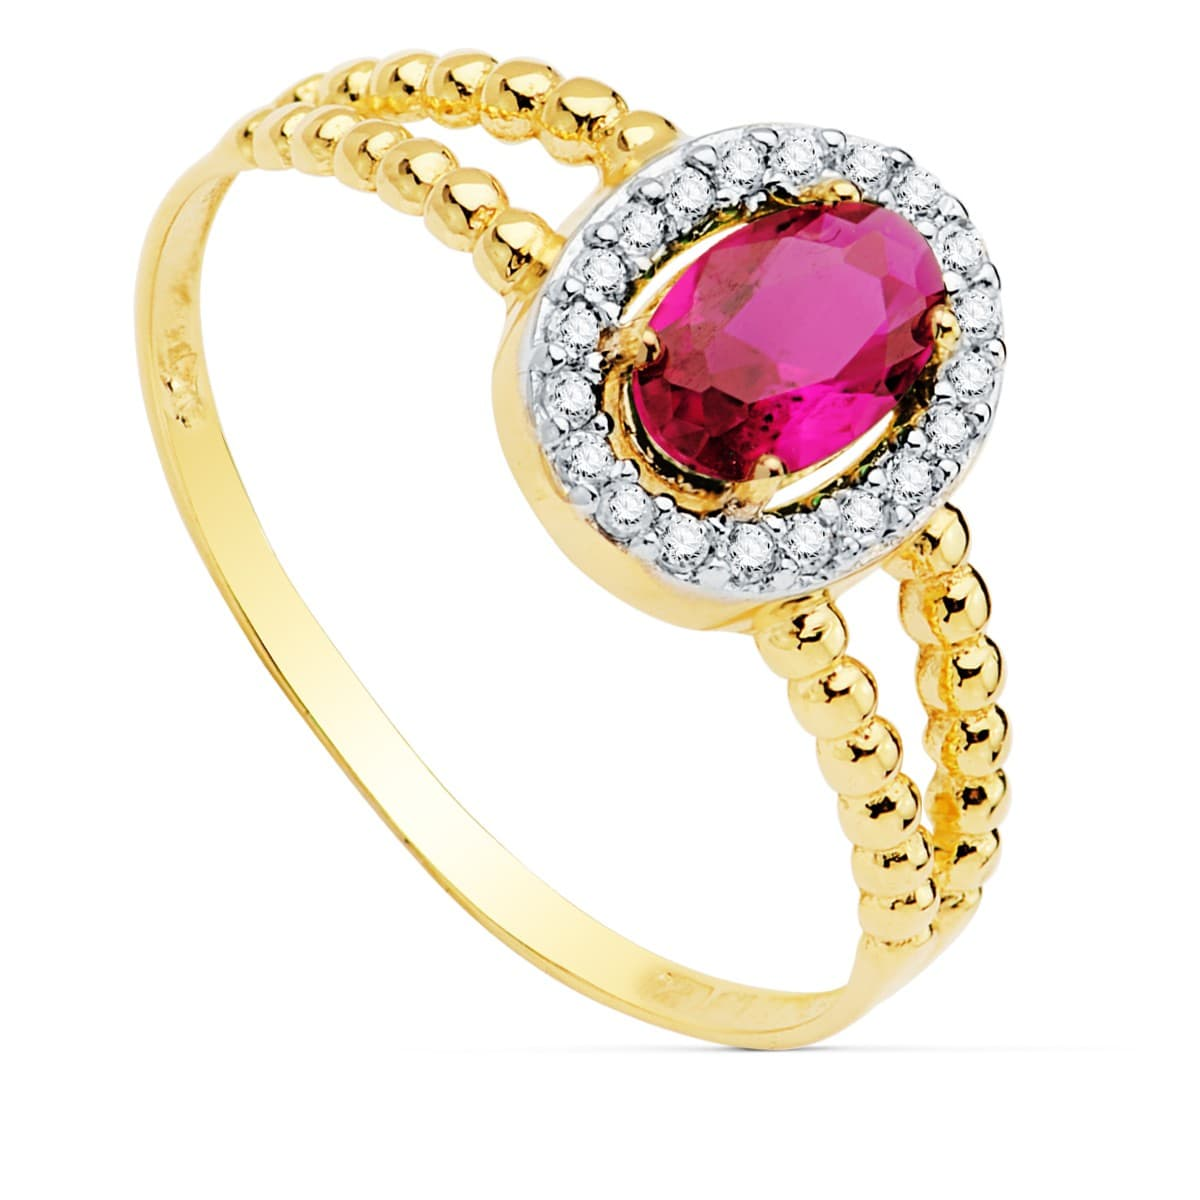 baf961d9e78c Sortija mujer Oro Amarillo 18K Orión Piedra Rosa anillo bolitas ...